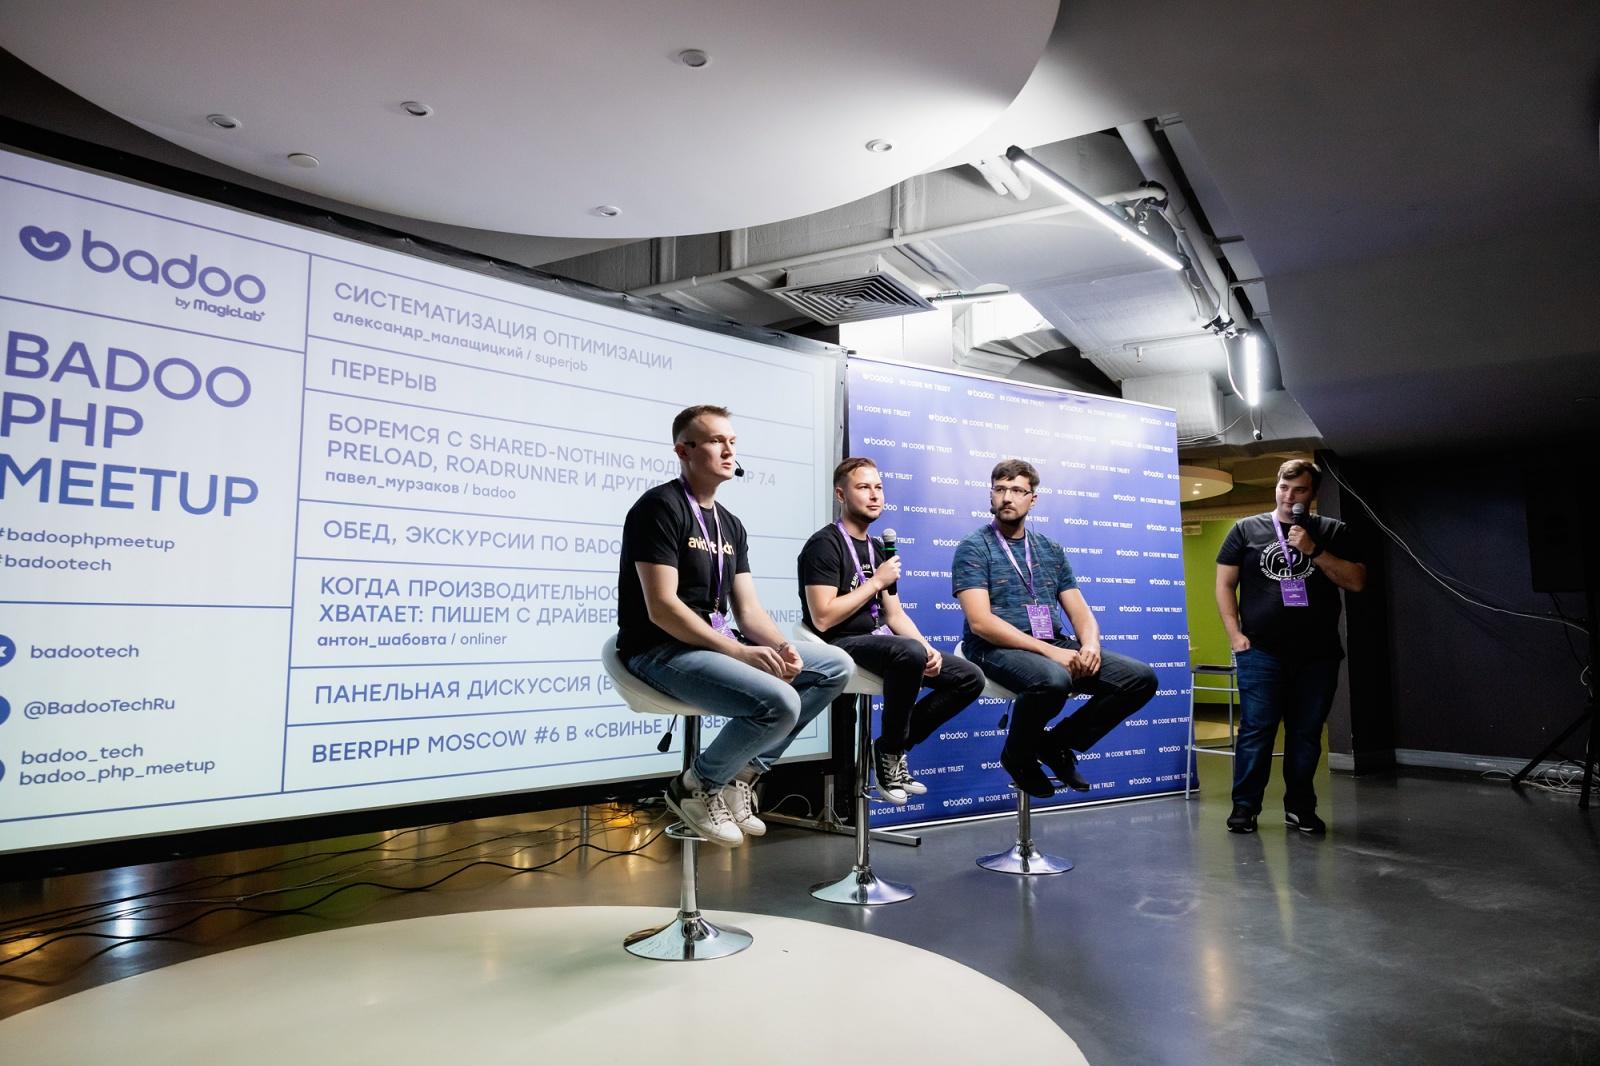 Железо или оптимизация? Badoo, Авито и Мамба — о производительности PHP - 2